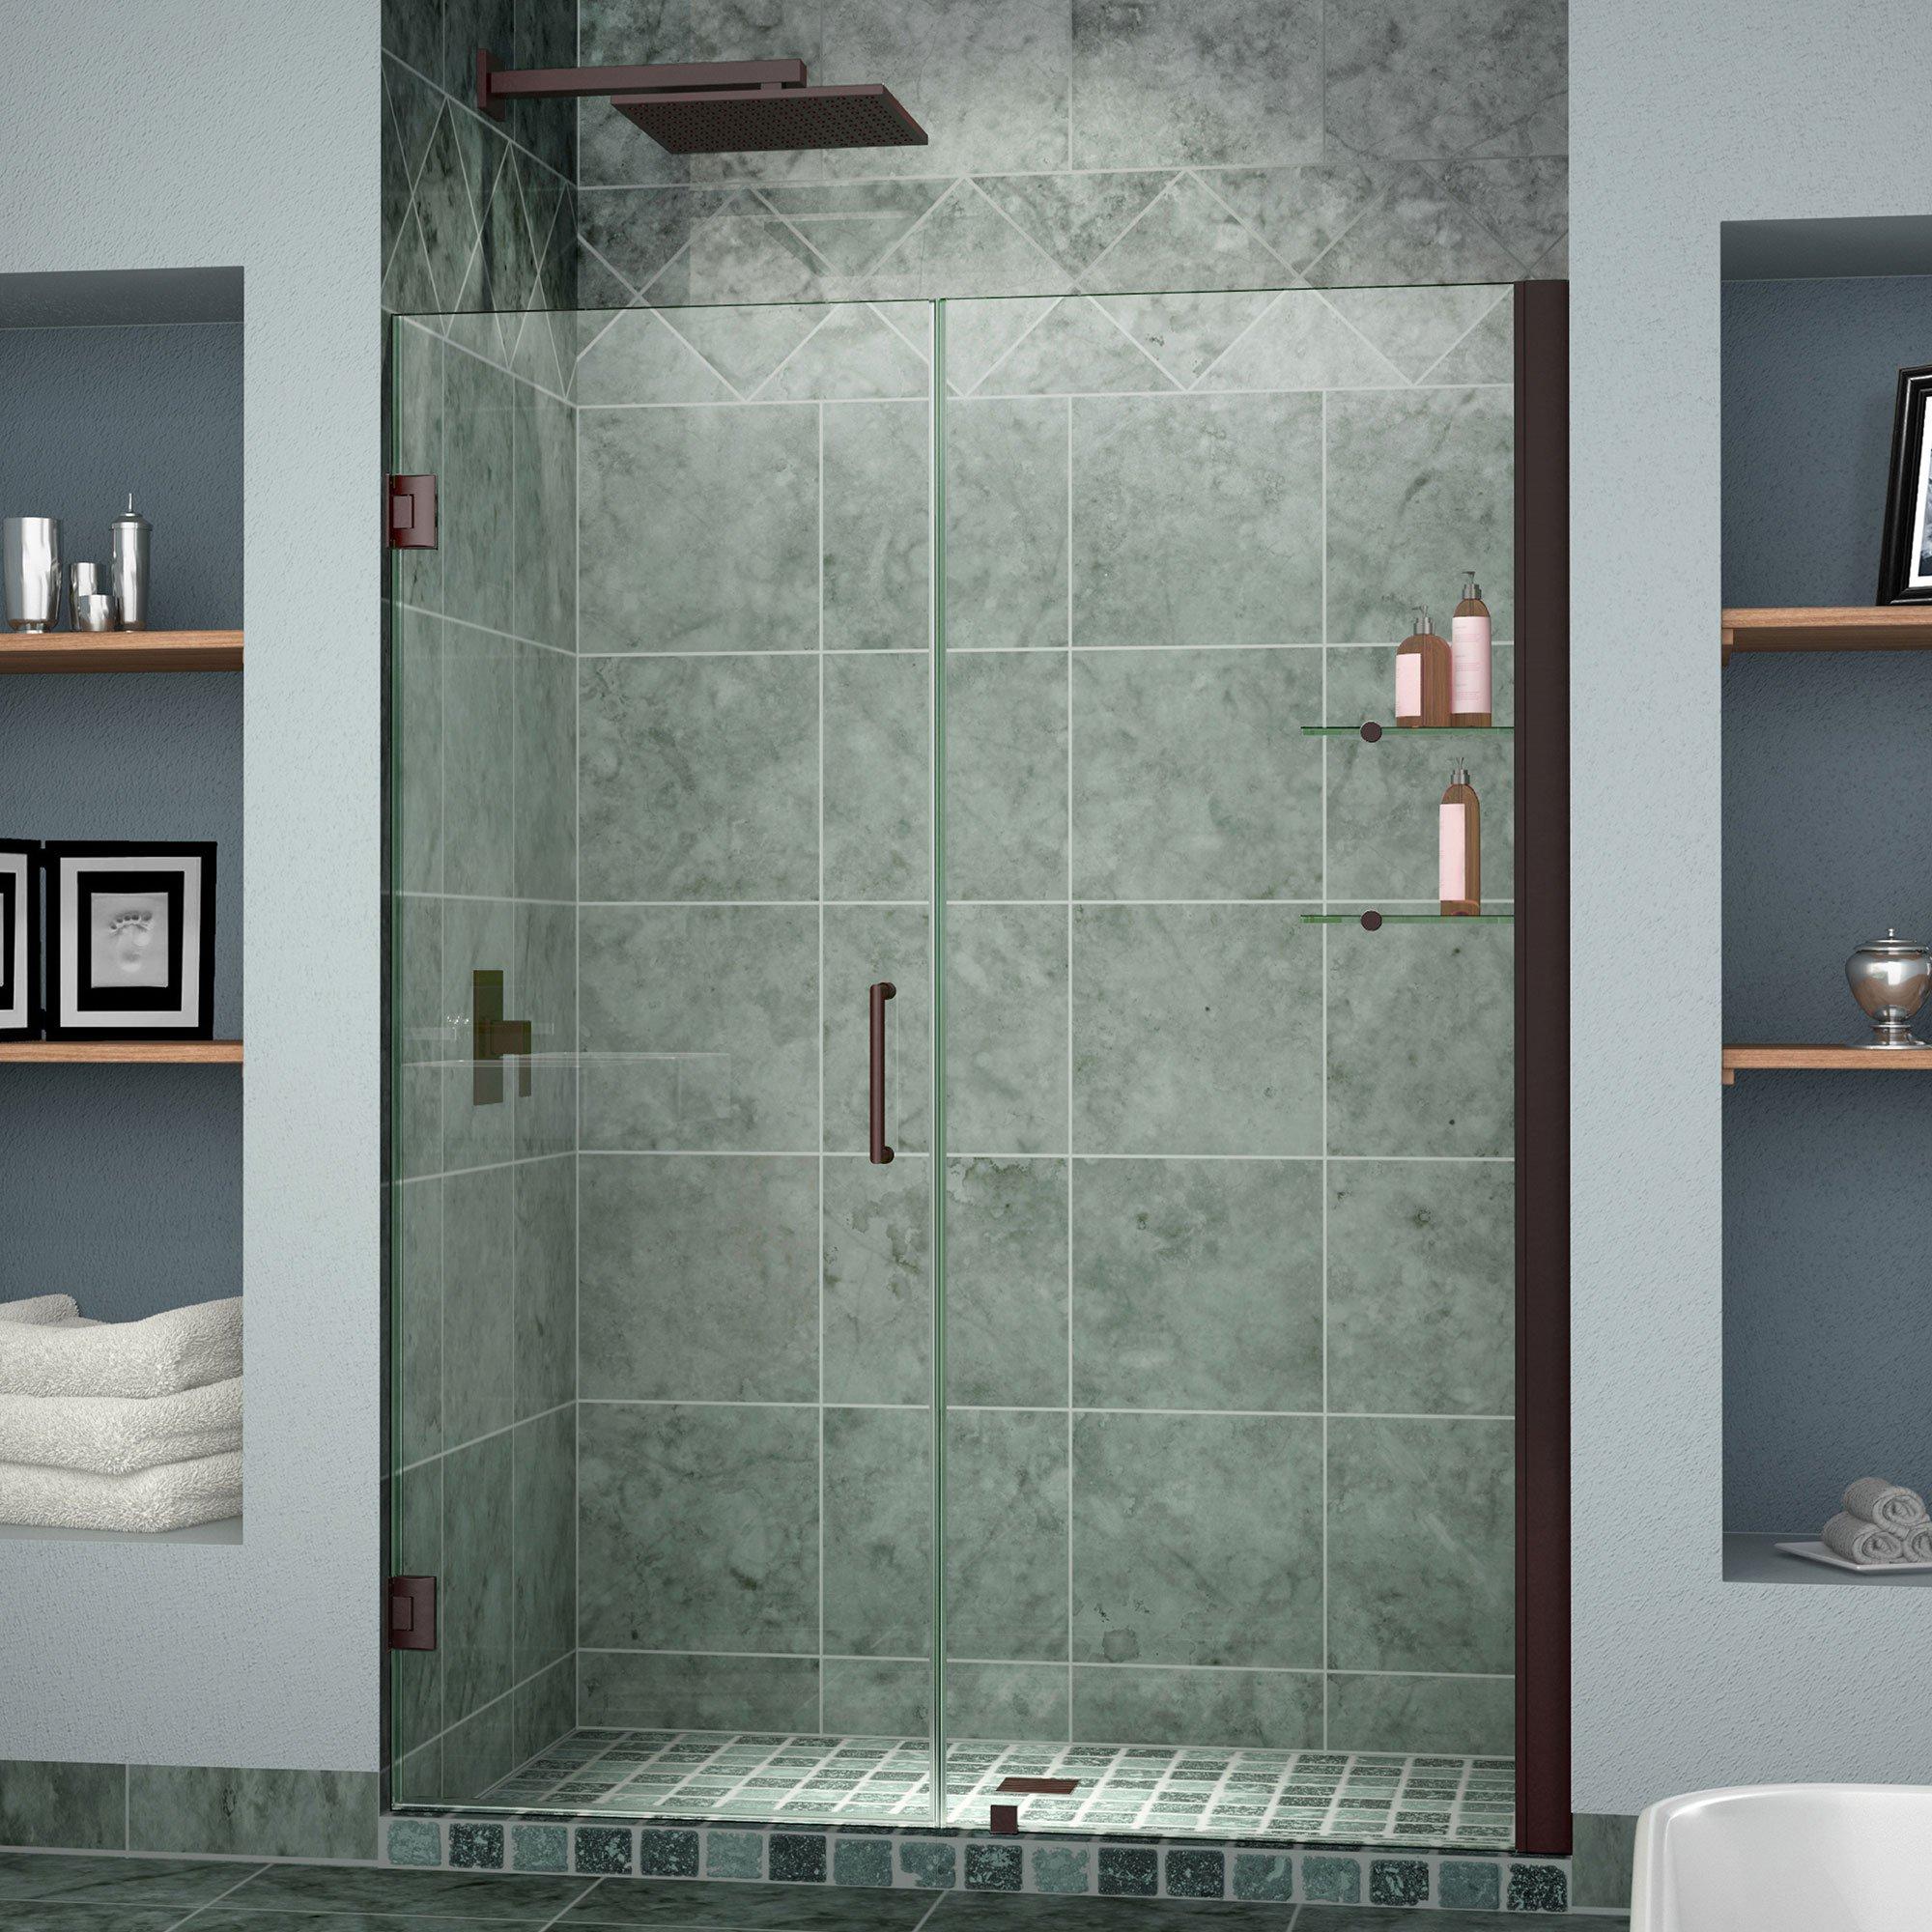 DreamLine Unidoor 42-43 in. Width, Frameless Hinged Shower Door, 3/8'' Glass, Oil Rubbed Bronze Finish by DreamLine